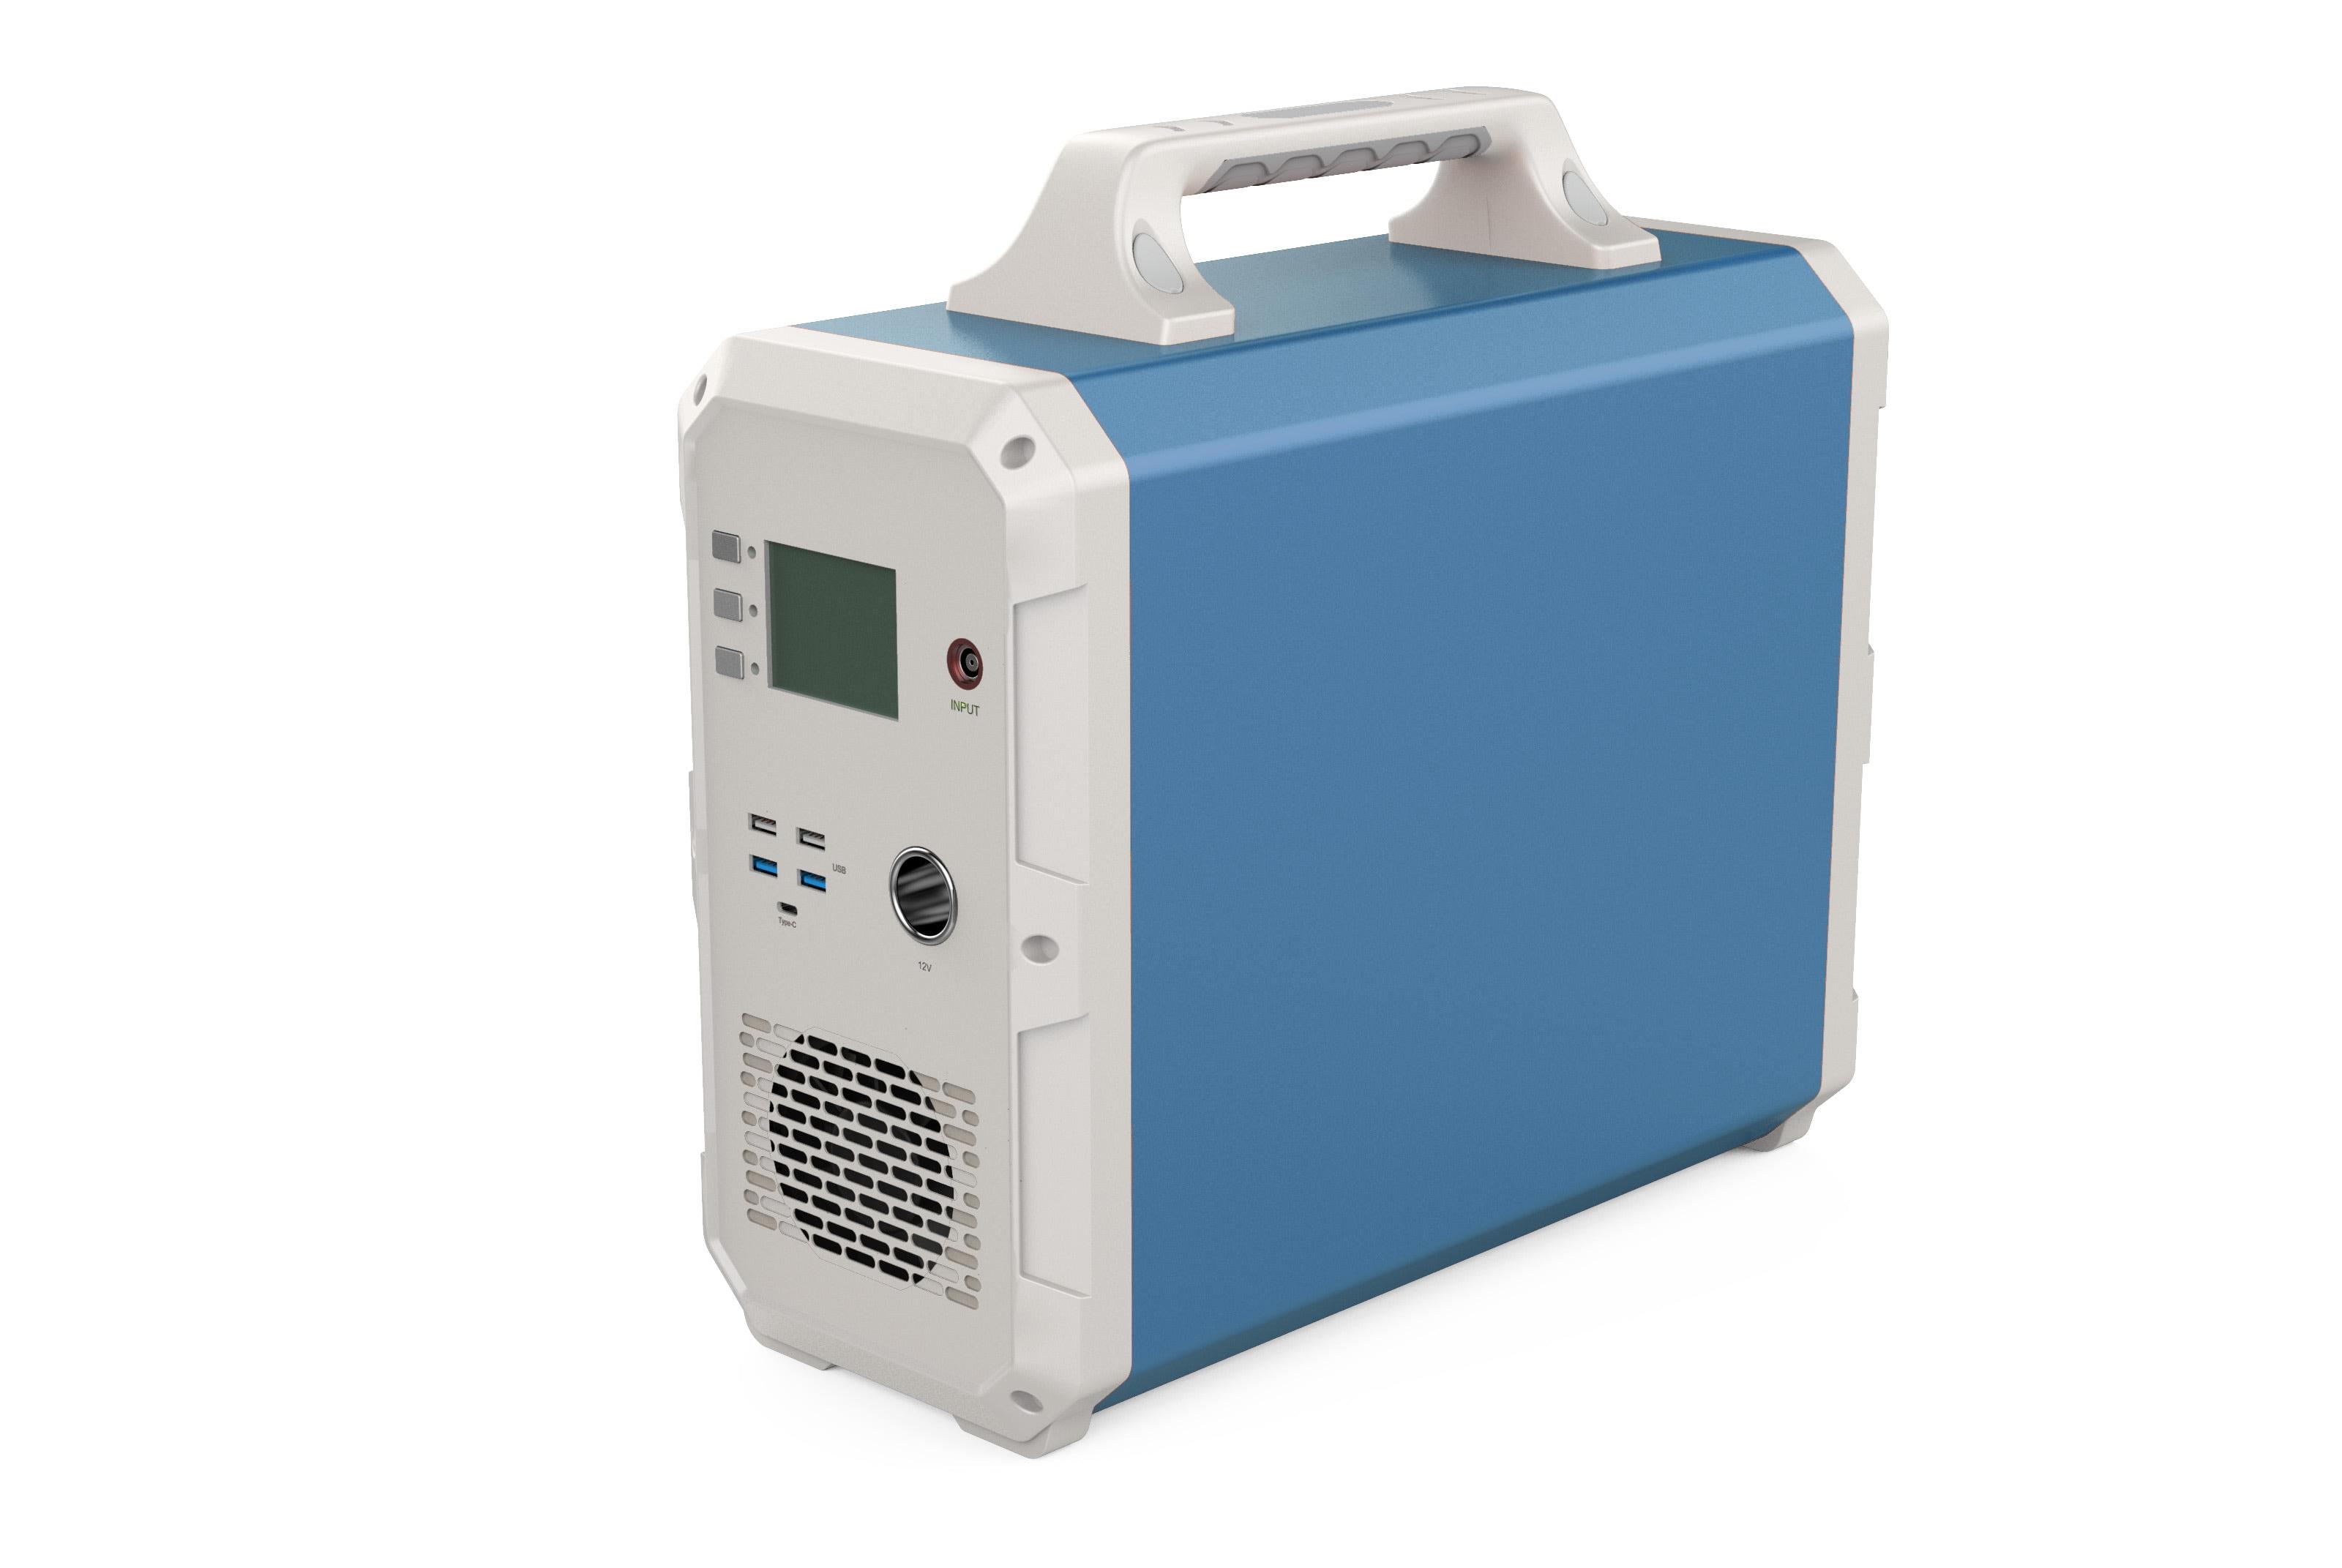 SolarPower Portable Solar Power Station